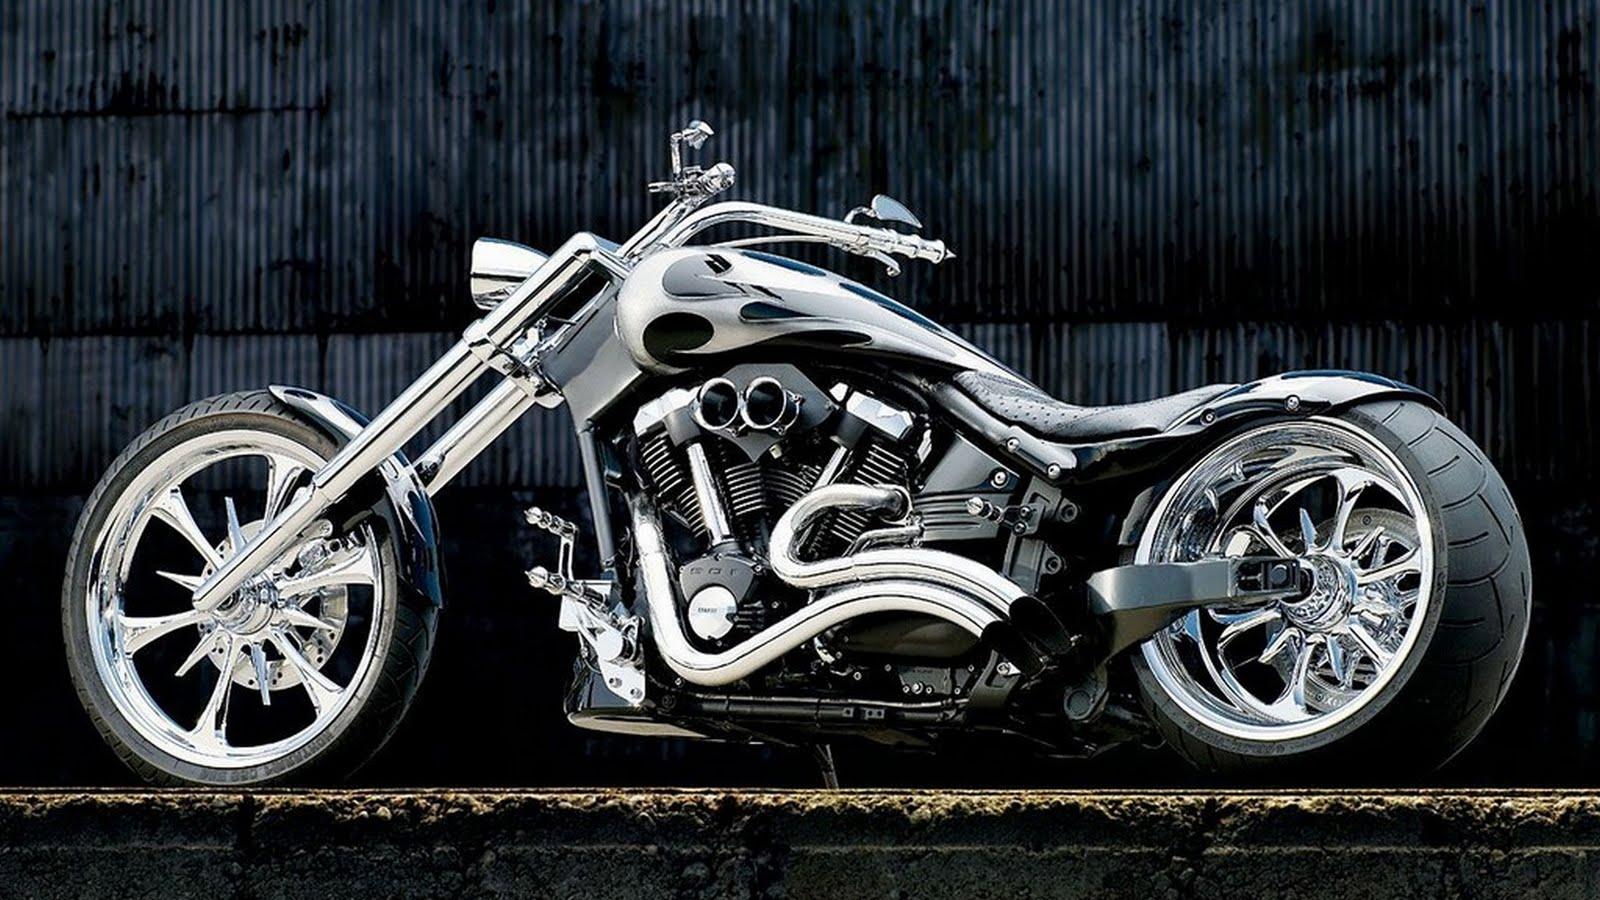 Motorcycle Wallpaper For PC  WallpaperSafari